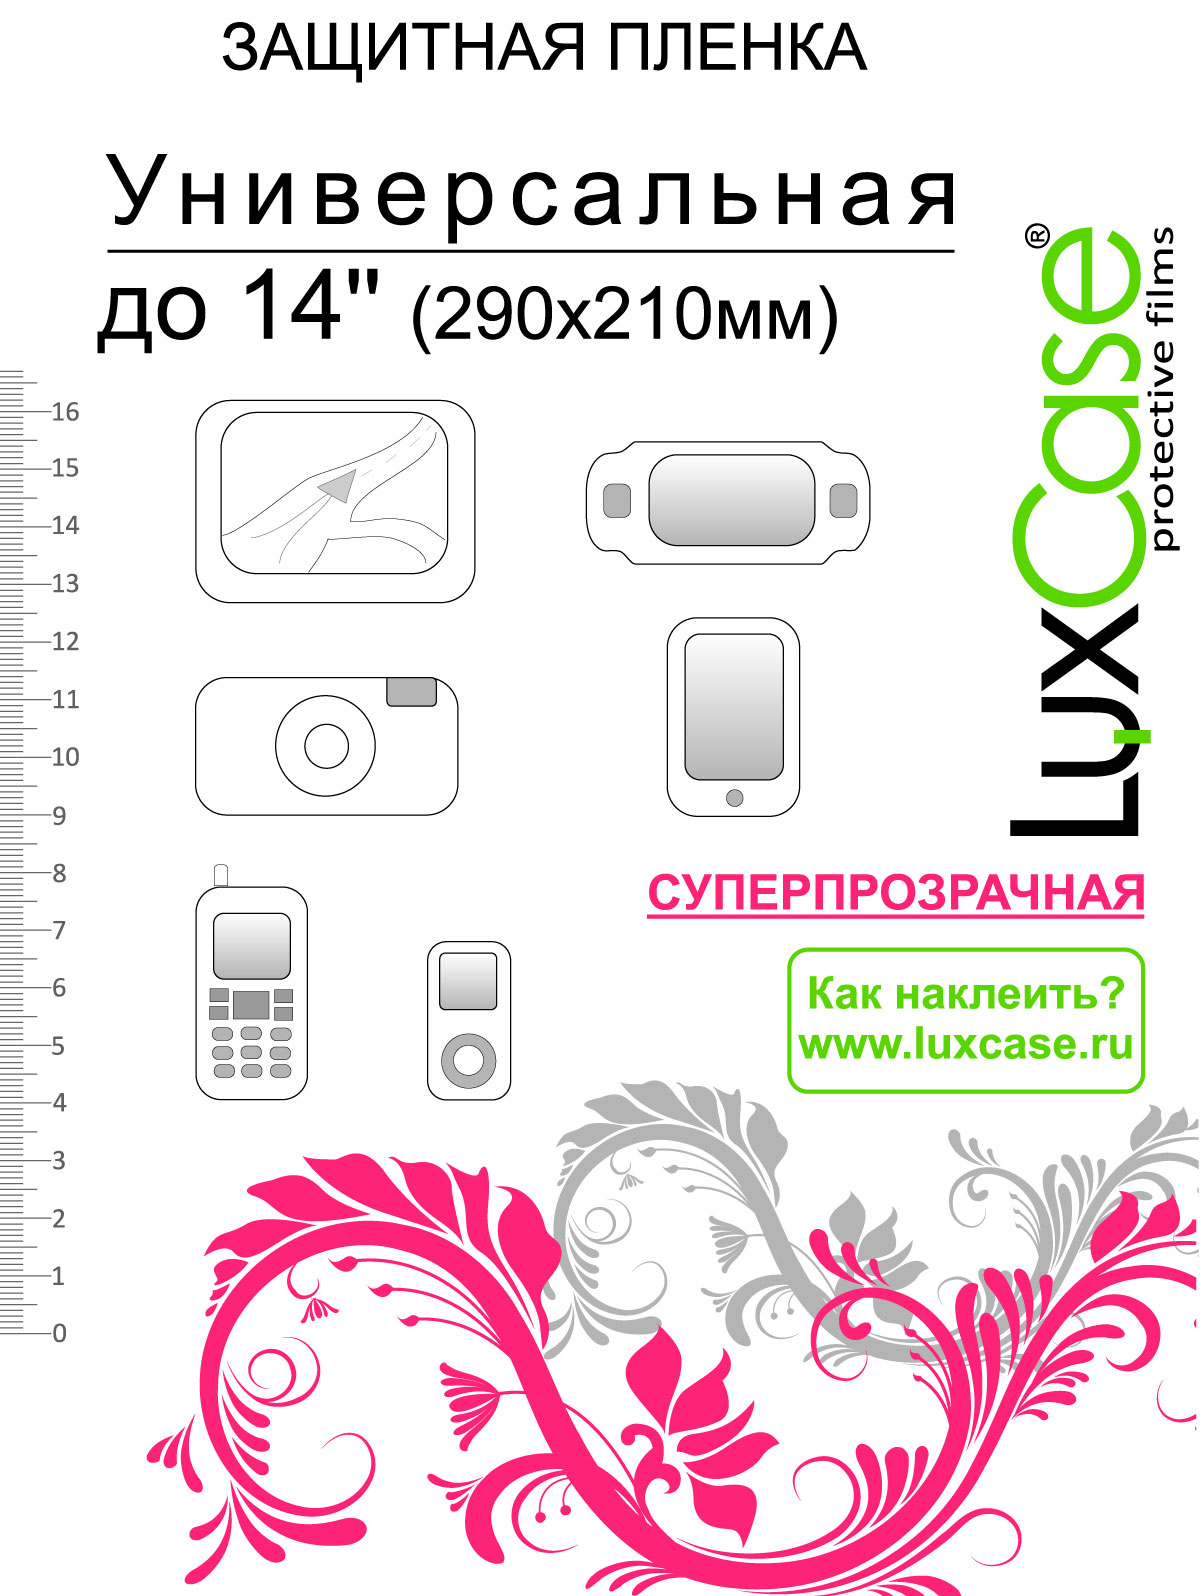 Luxcase универсальная защитная пленка для экрана 14'' (290x210 мм), суперпрозрачная